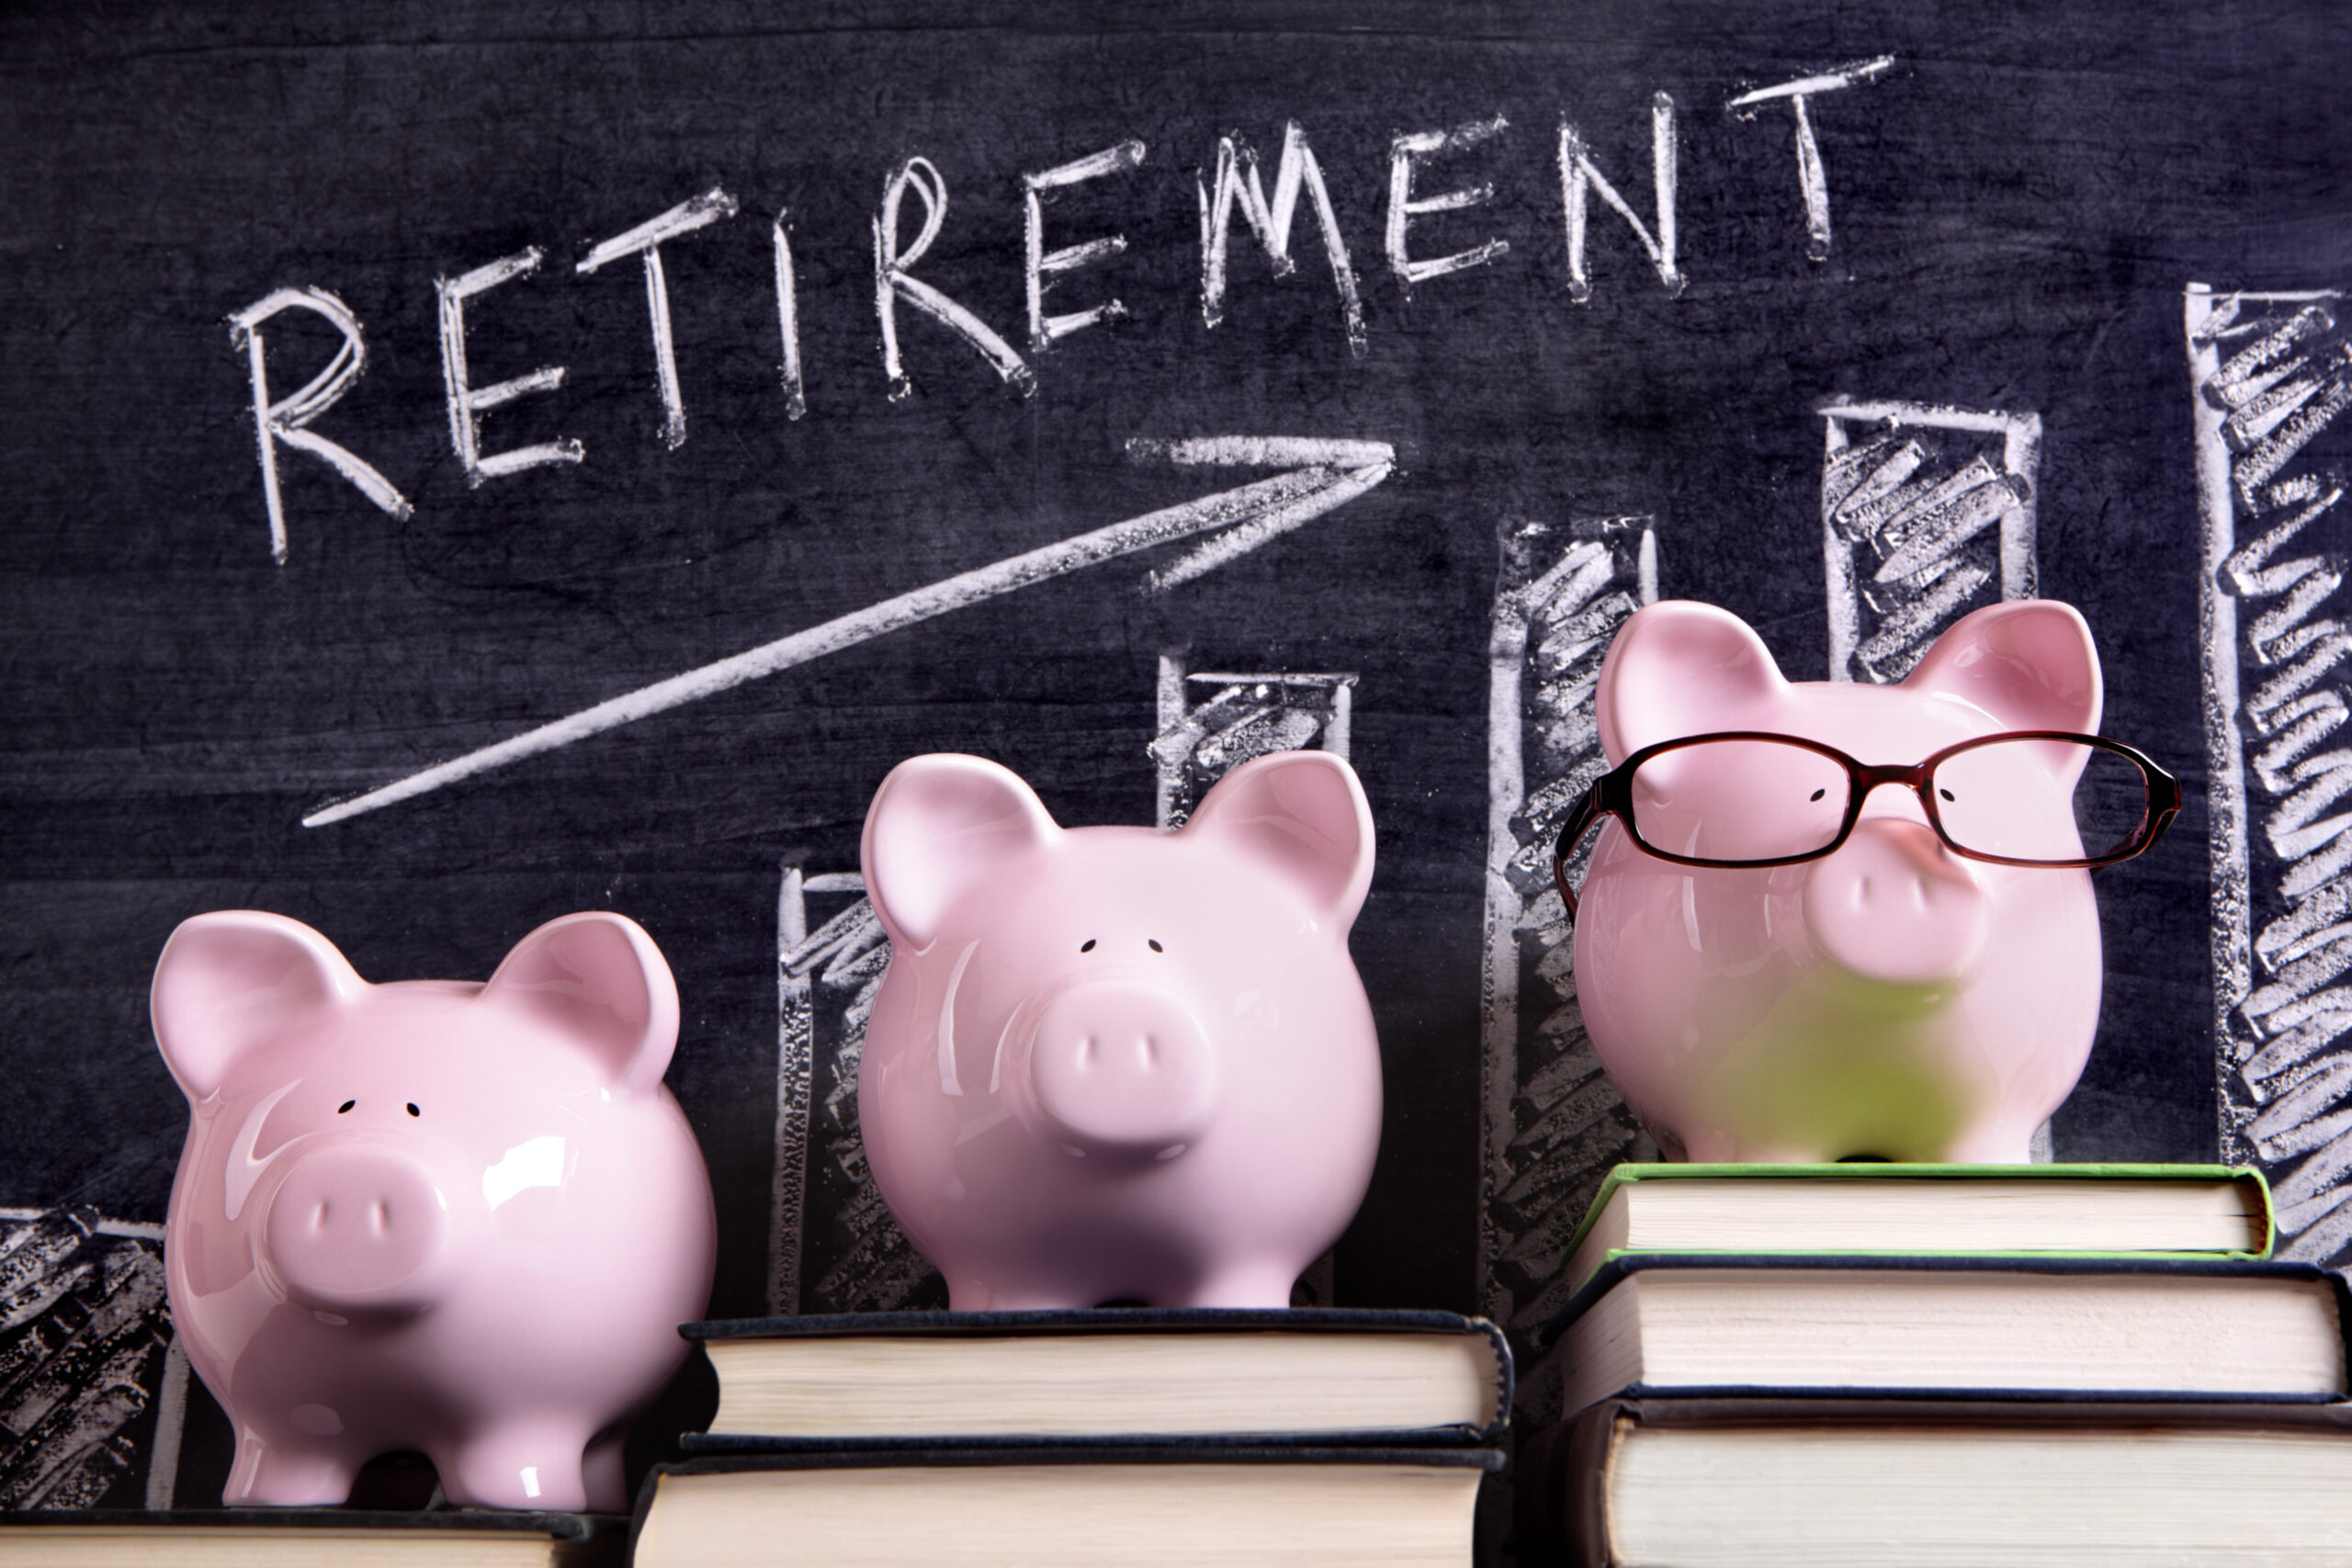 teacher pension enough for retirement - Piggy Banks with retirement savings chart